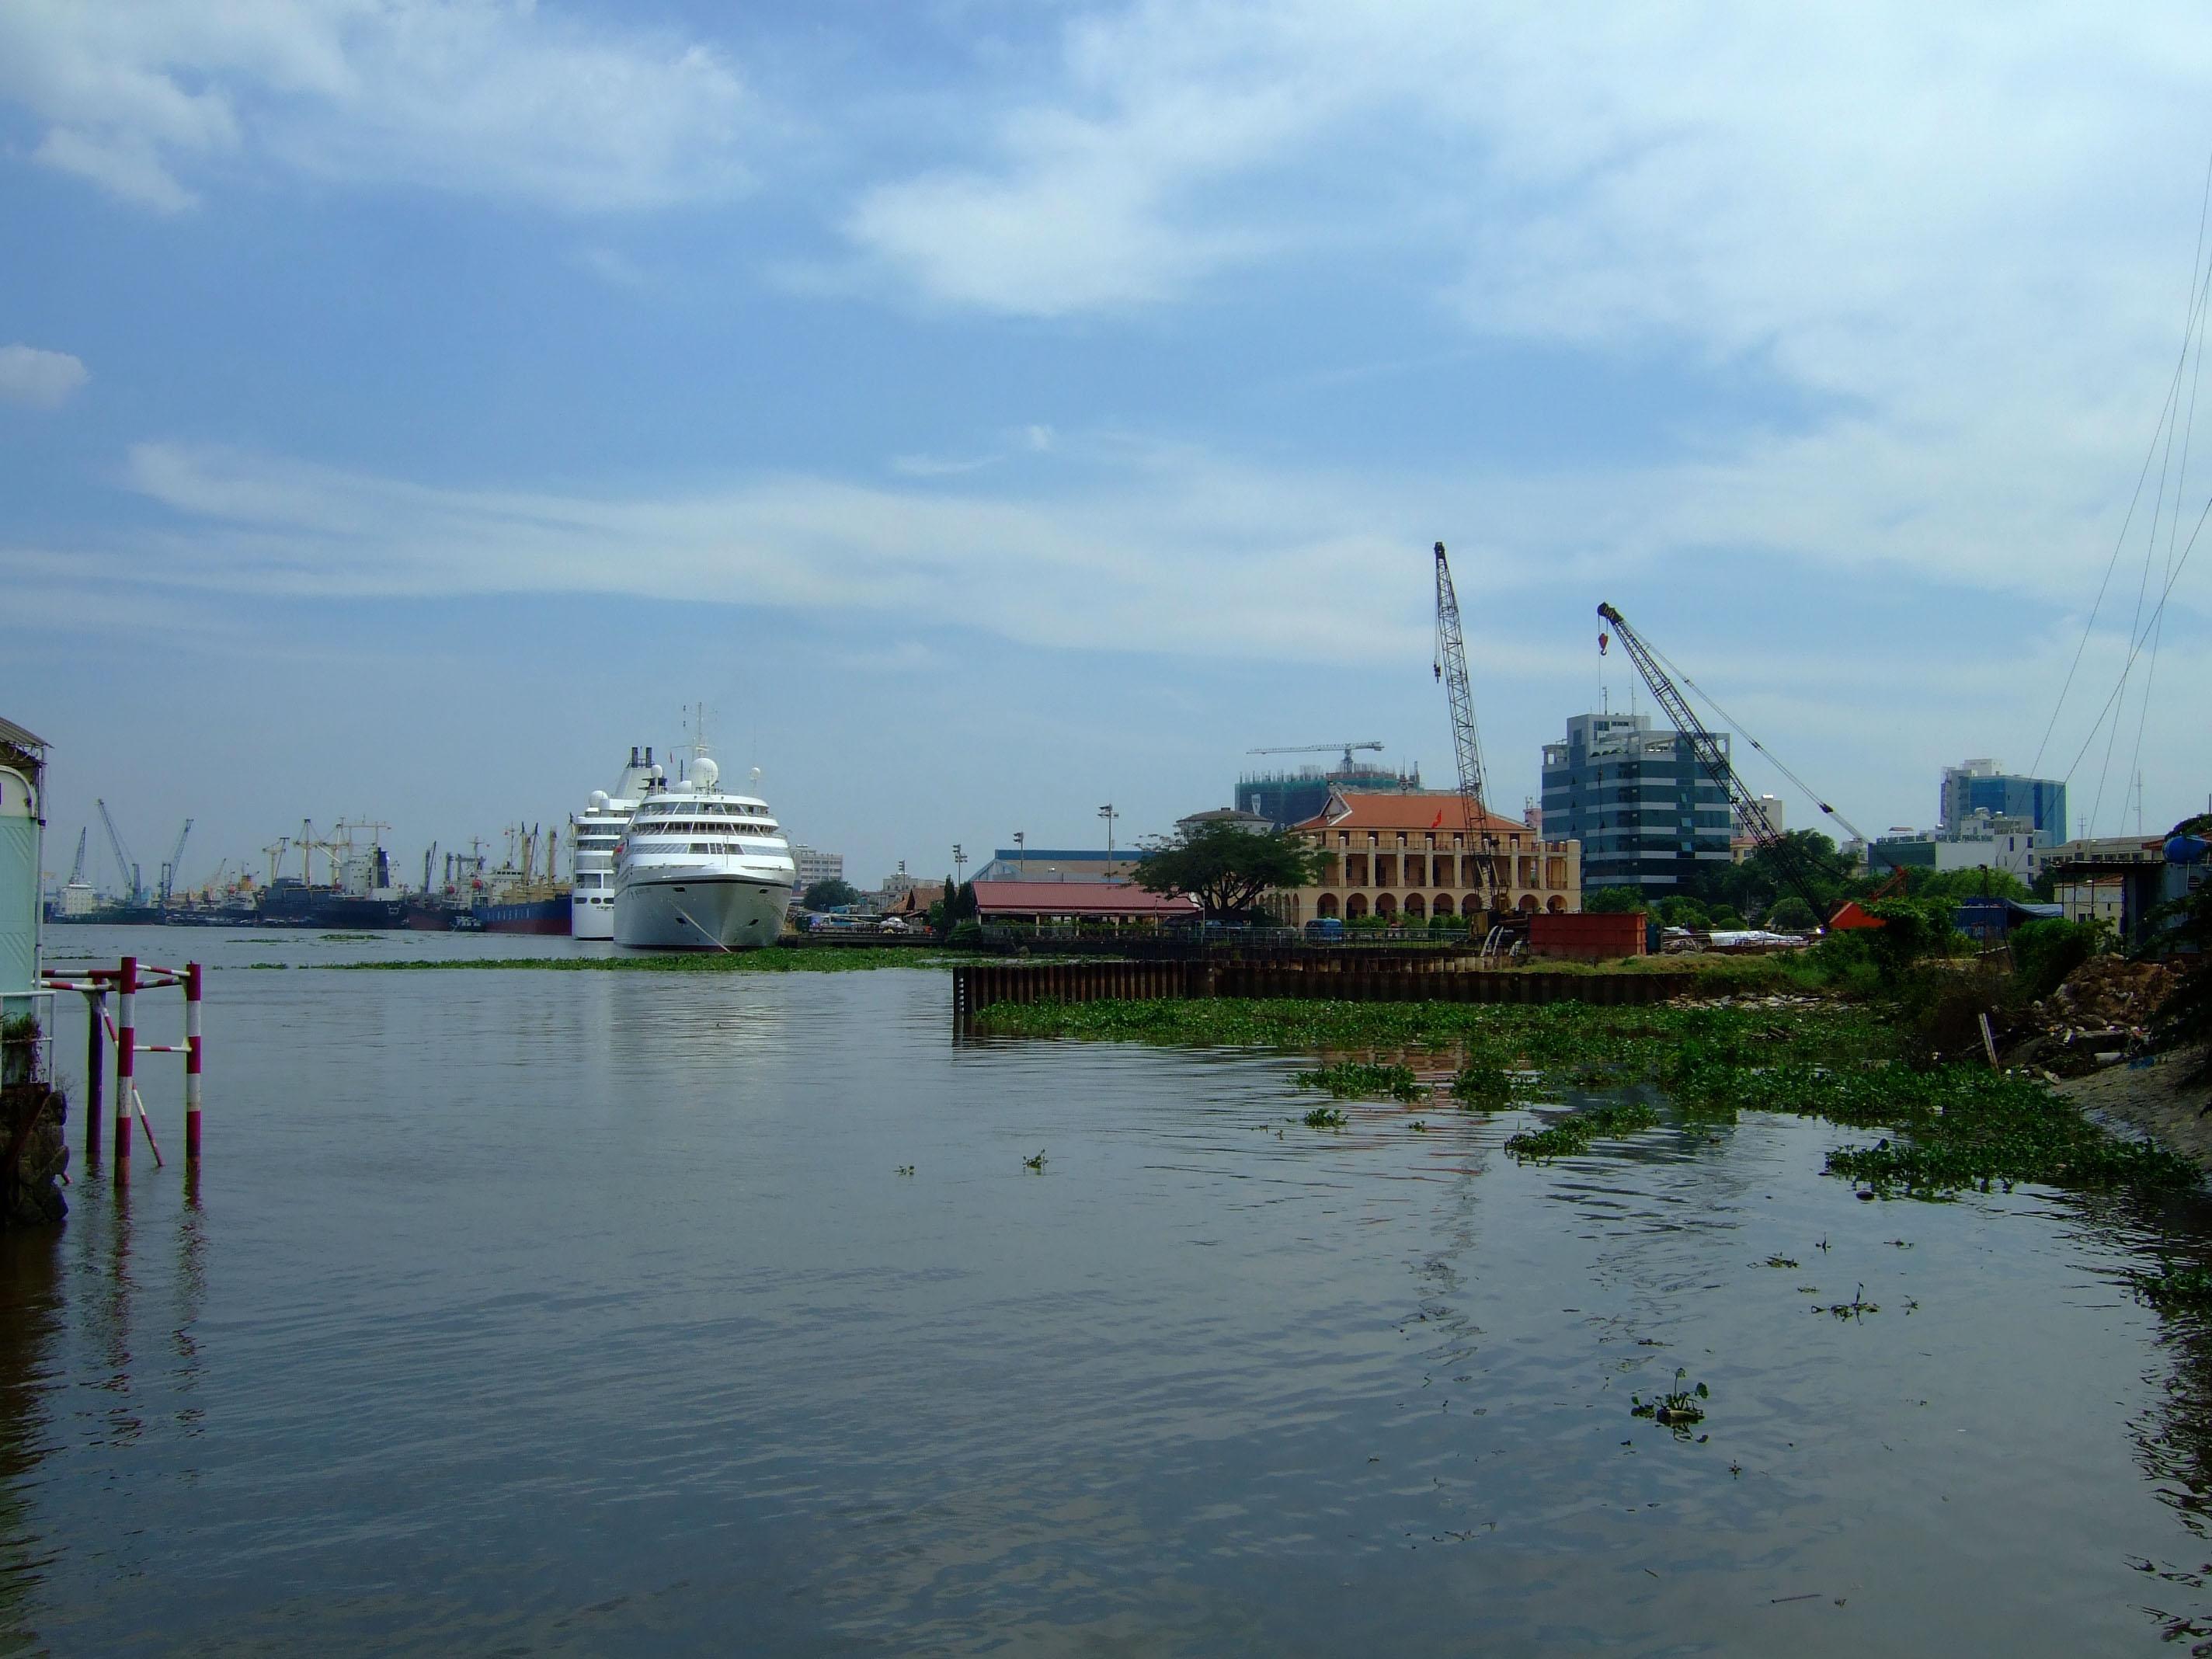 Vietnam Ho Chi Minh City Saigon harbor ships Feb 2009 03